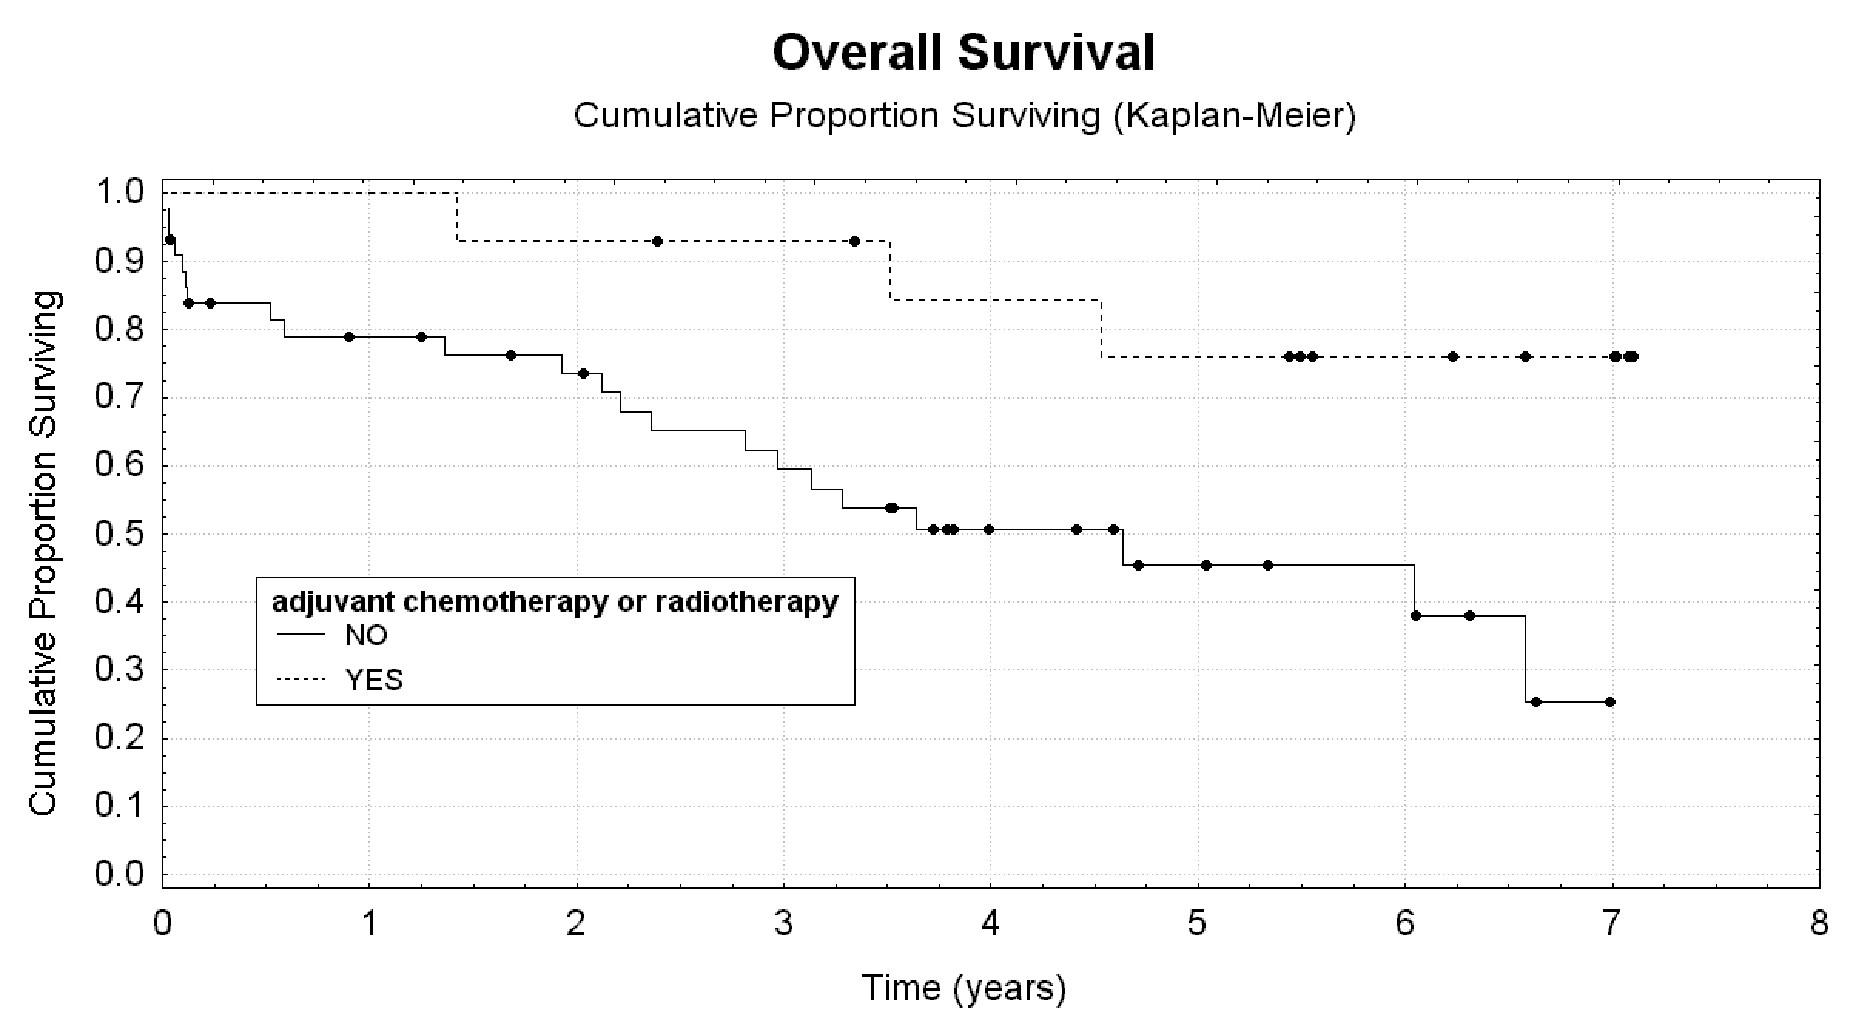 Adjuvantní chemoterapie nebo radioterapie jako prognostický faktor celkového přežití nemocných s komplikacemi IIIA, IIIB, IV a V hodnocenými dle Claviena a Dinda Graph 13: Adjuvant chemotherapy or radiotherapy as a prognostic factor for overal survival in patients with Grade IIIA, IIIB, IV, V complications evaluated according to Clavien and Dindo